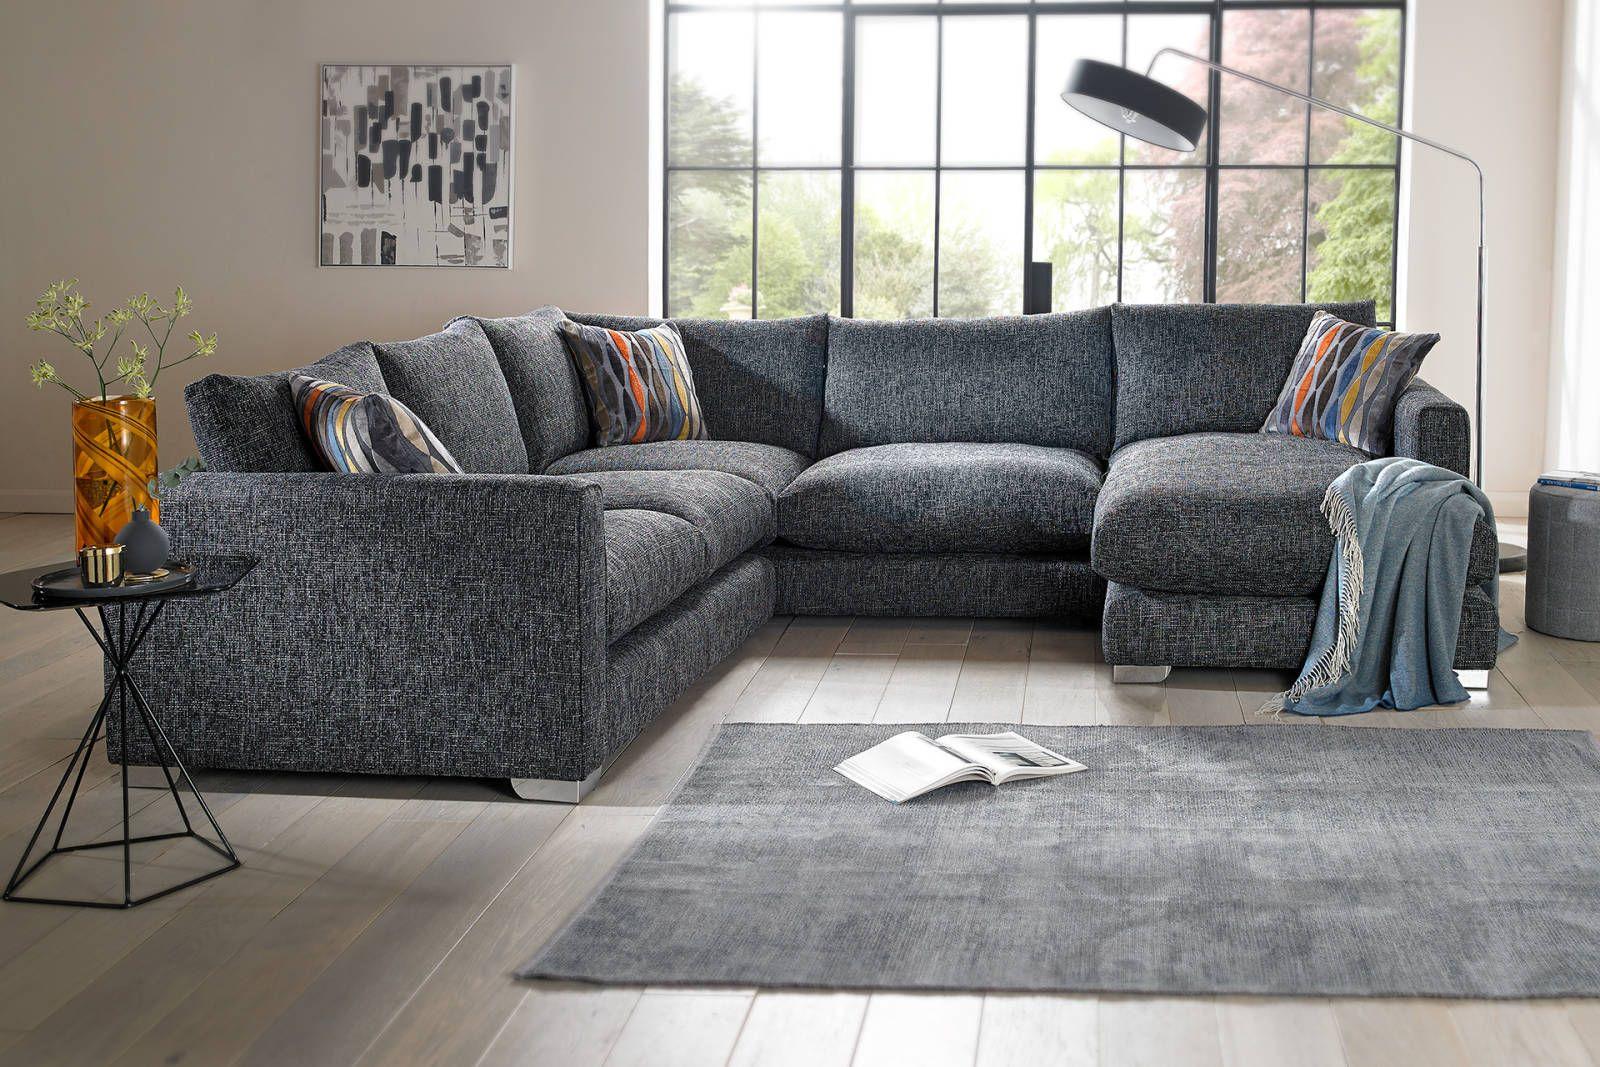 Majestic Sofology Corner Sofa Living Room Couches Living Room Leather Couch Living Room Decor